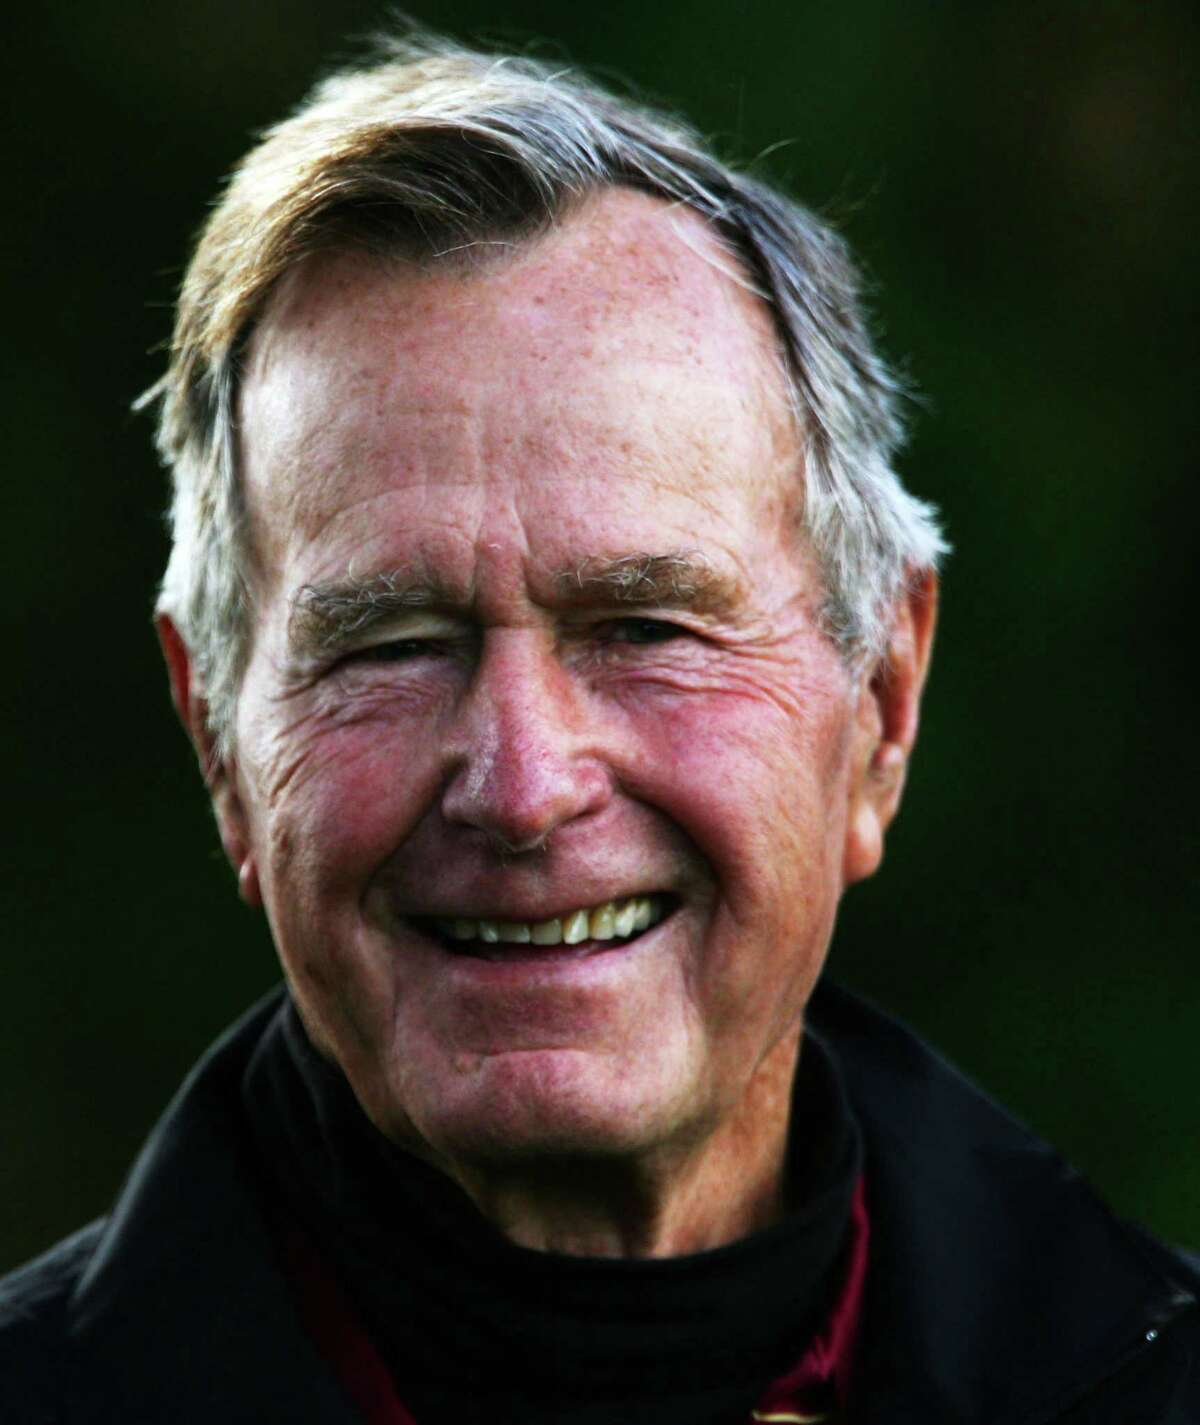 Houston - George H.W. Bush Former president